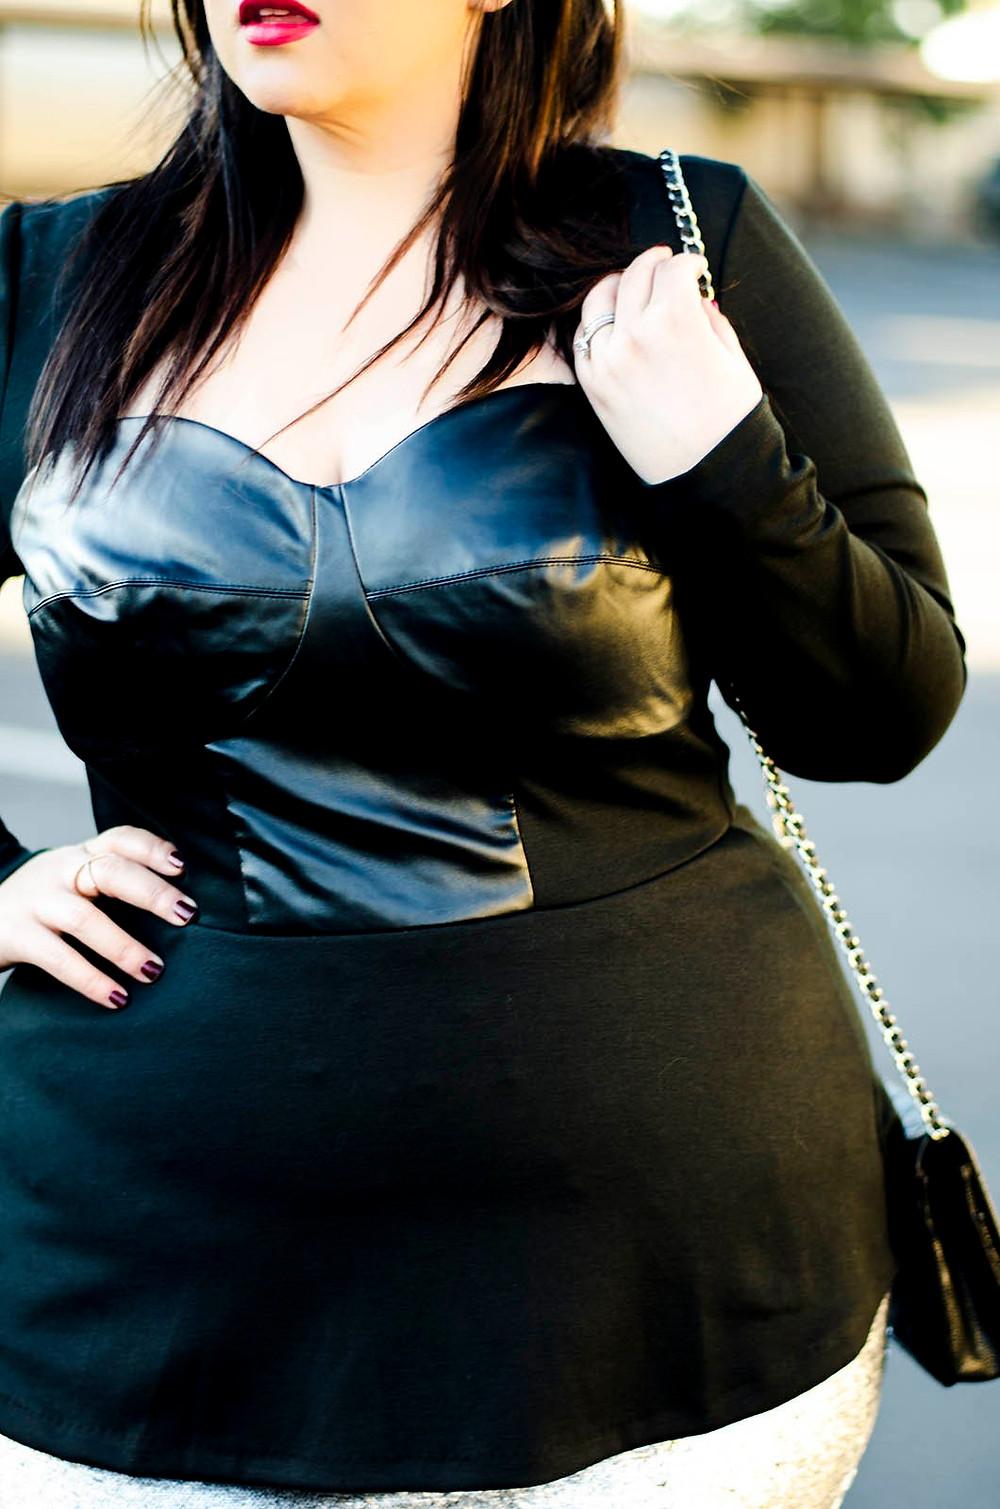 plus size ootd eloquii sequins sleek chic edgy minimalist fashion flattering pencil skirt crystal coons sometimesglam